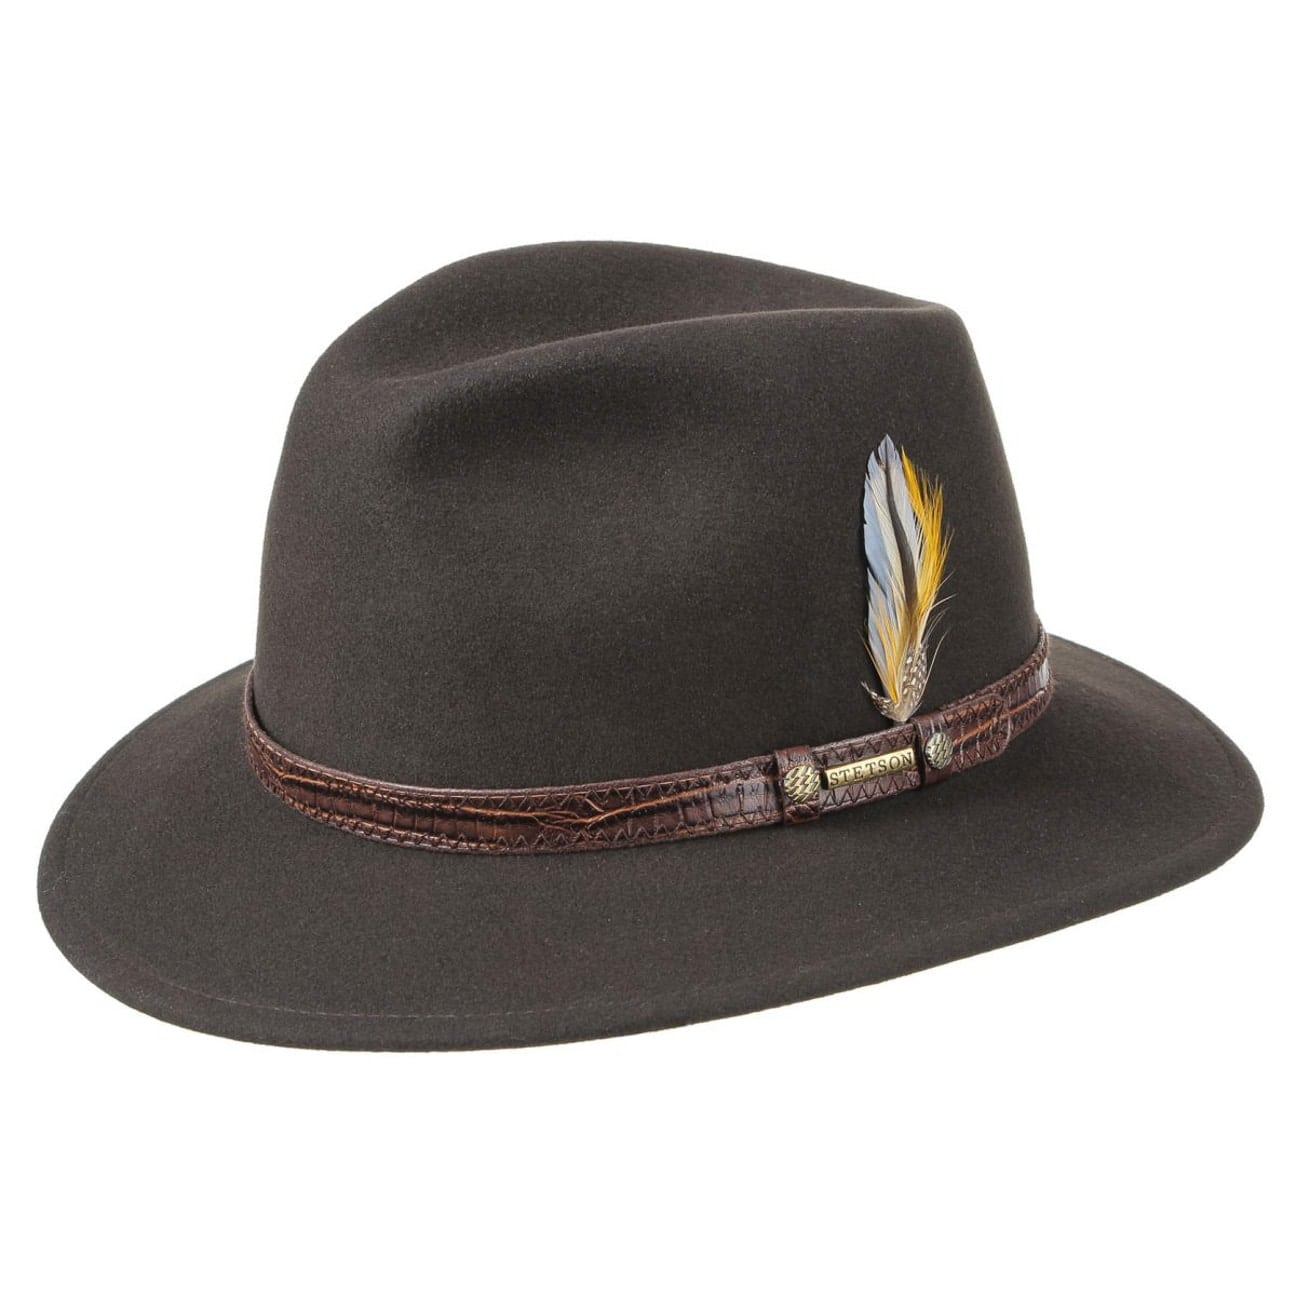 Sombrero VitaFelt Sells by Stetson  fieltro de lana